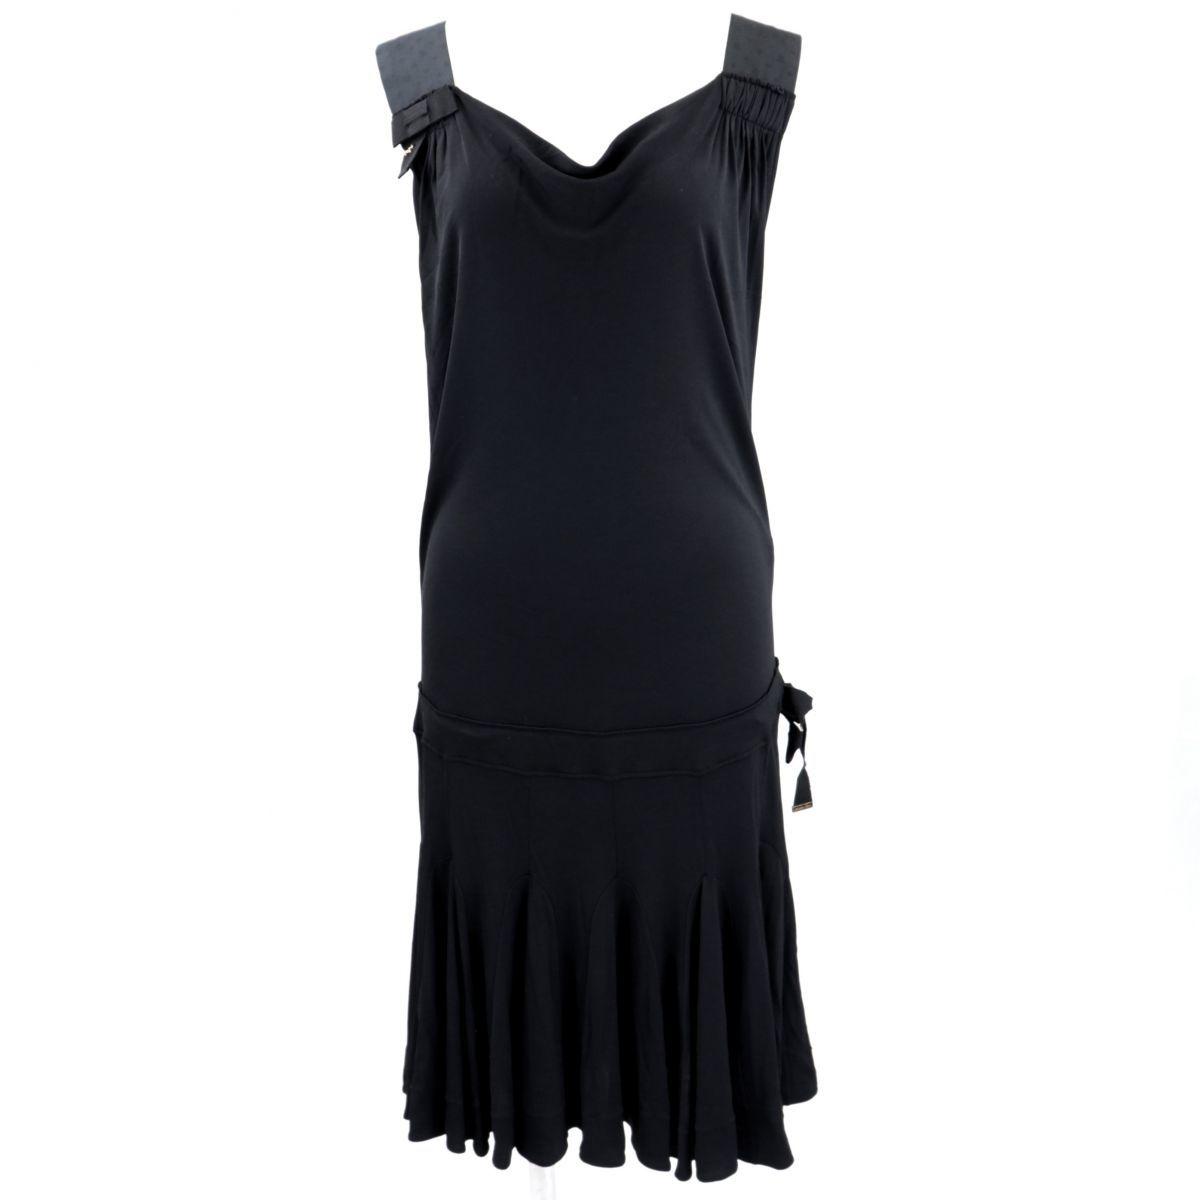 Louis Vuitton 09AW Monogram Sleeveless Flare Dress Ladies Black Rayon